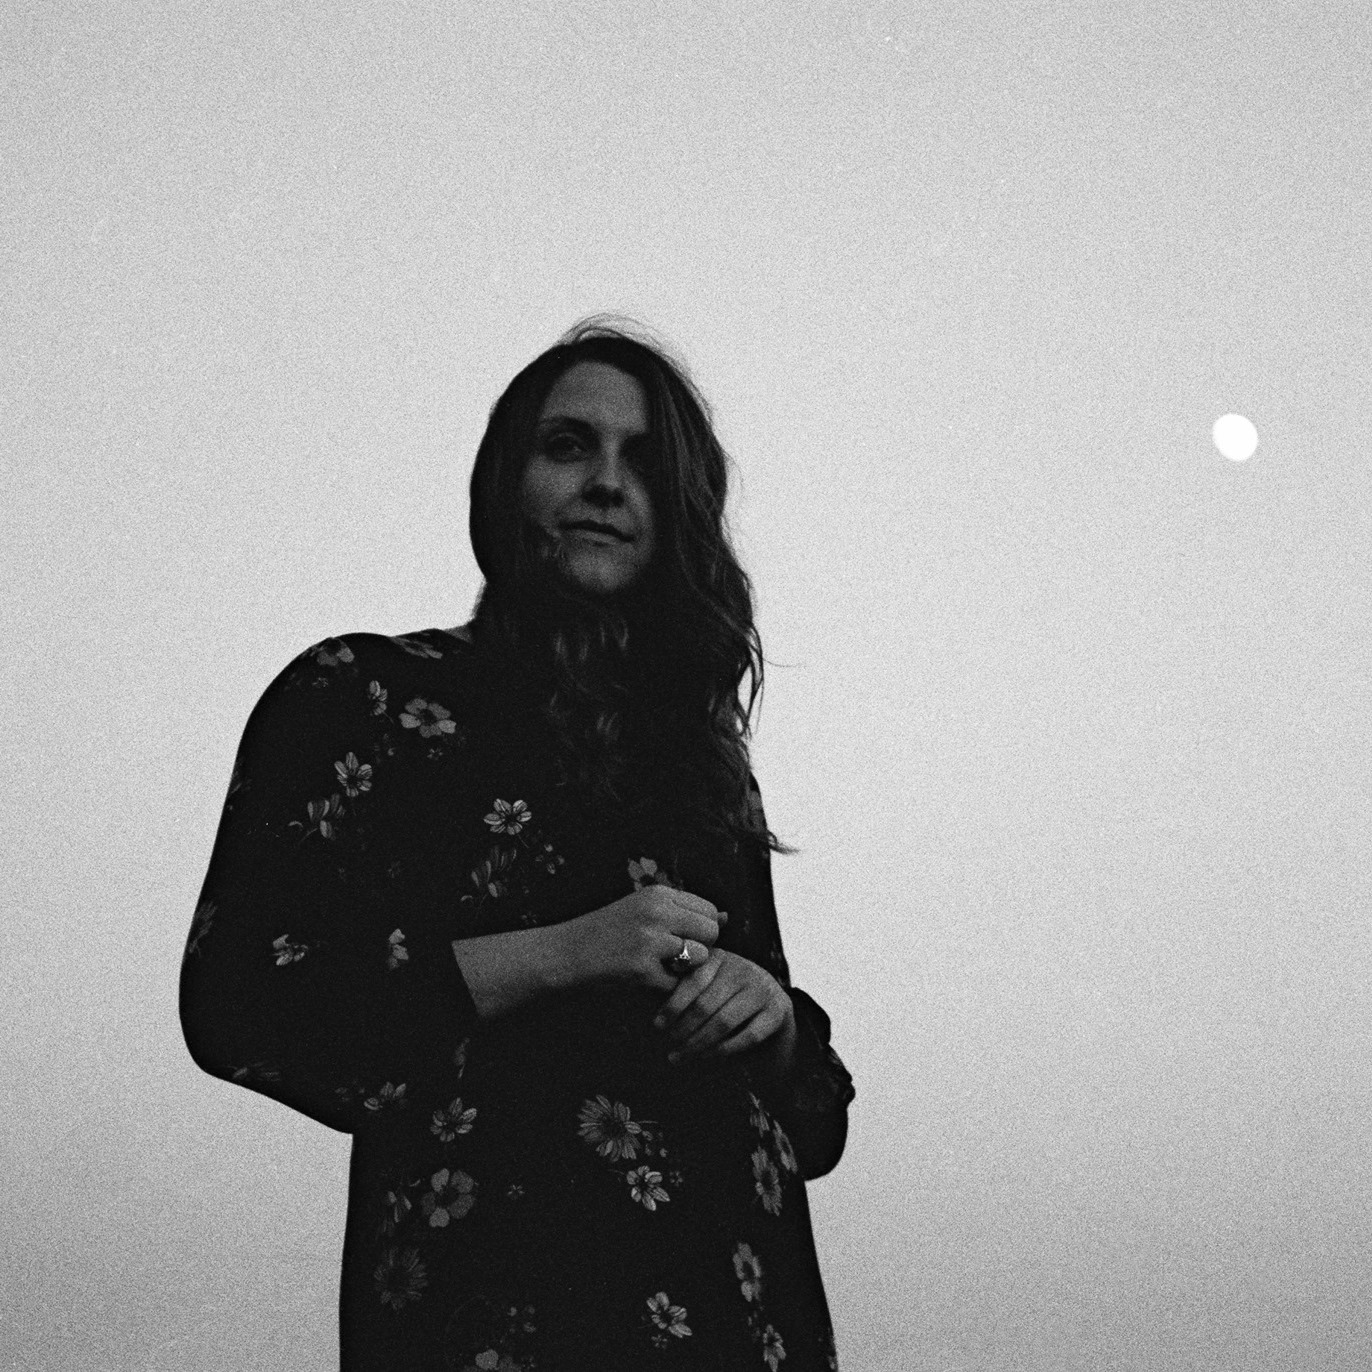 Caroline Spence, photo by Laura E. Partain.